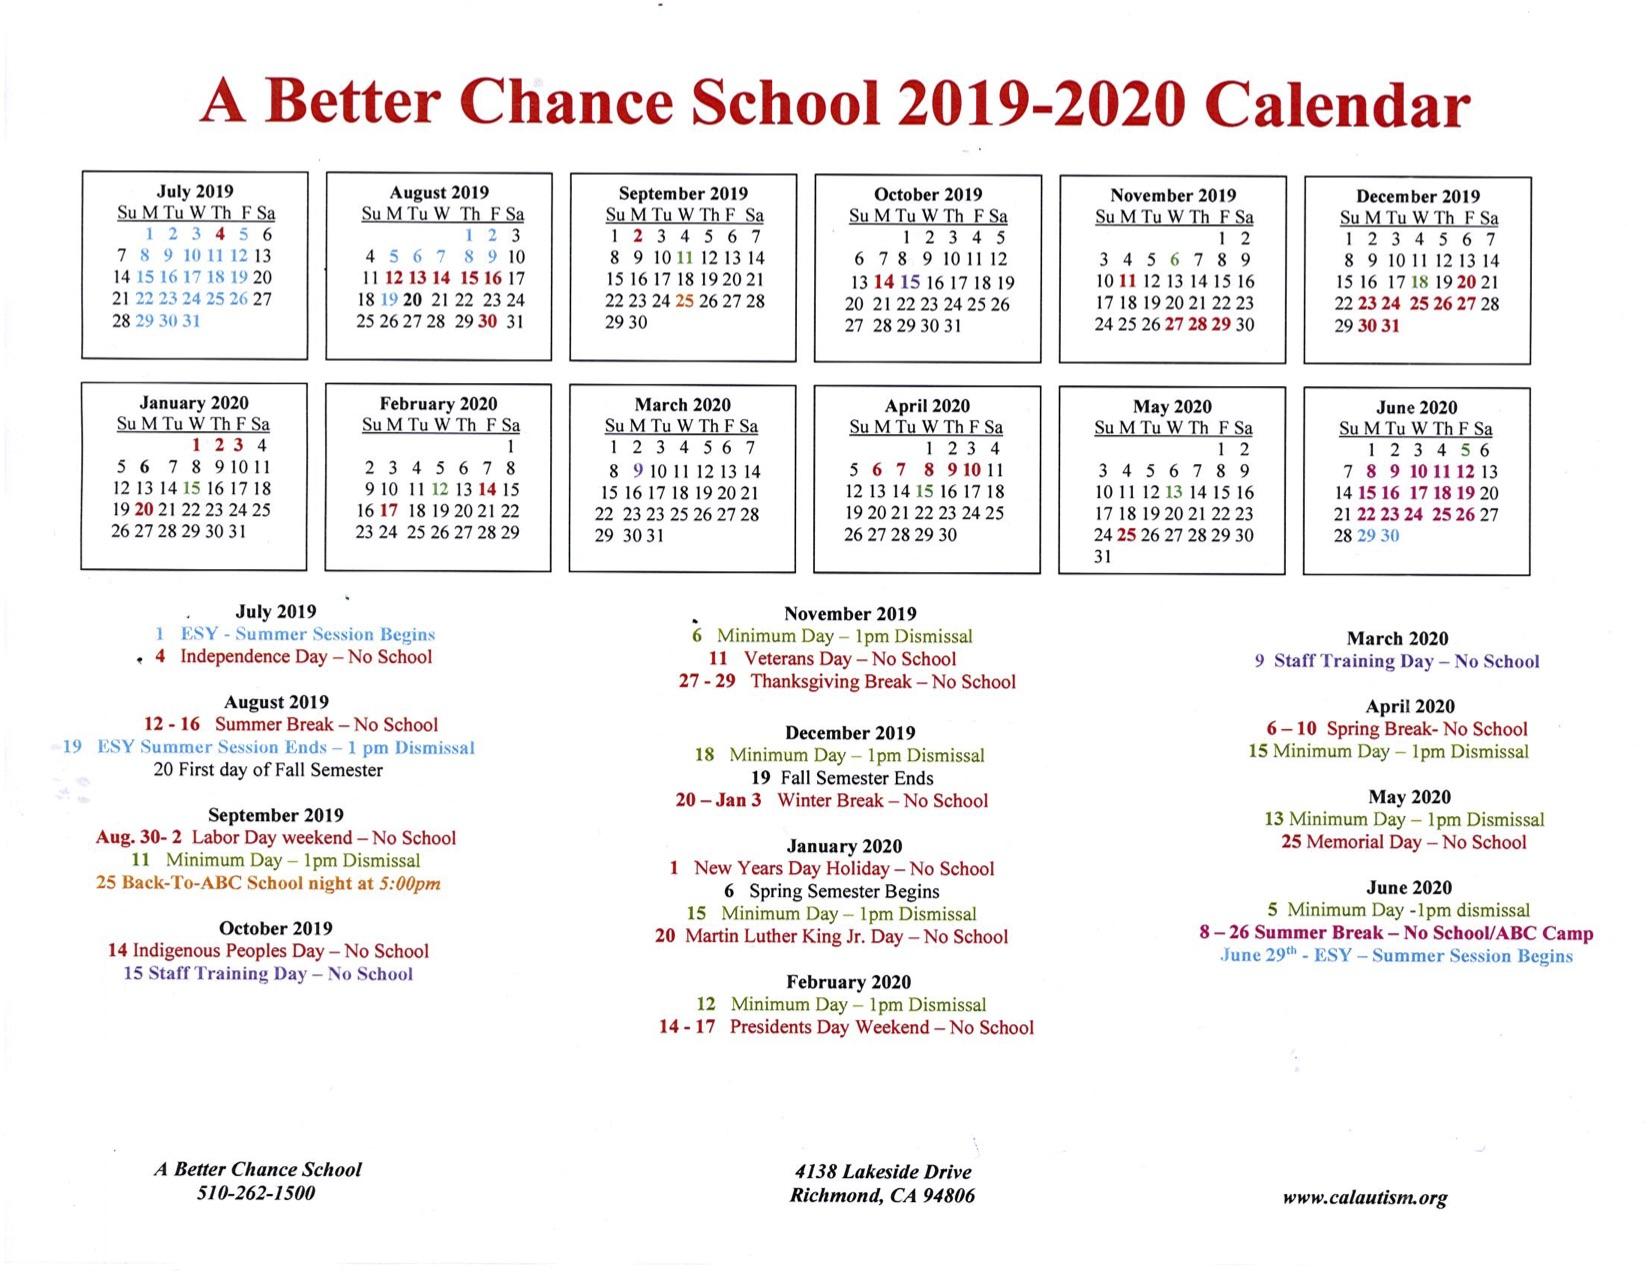 A Better Chance School 2019-2020 Calendar « California Autism Foundation for U Of M Calander 2019-2020